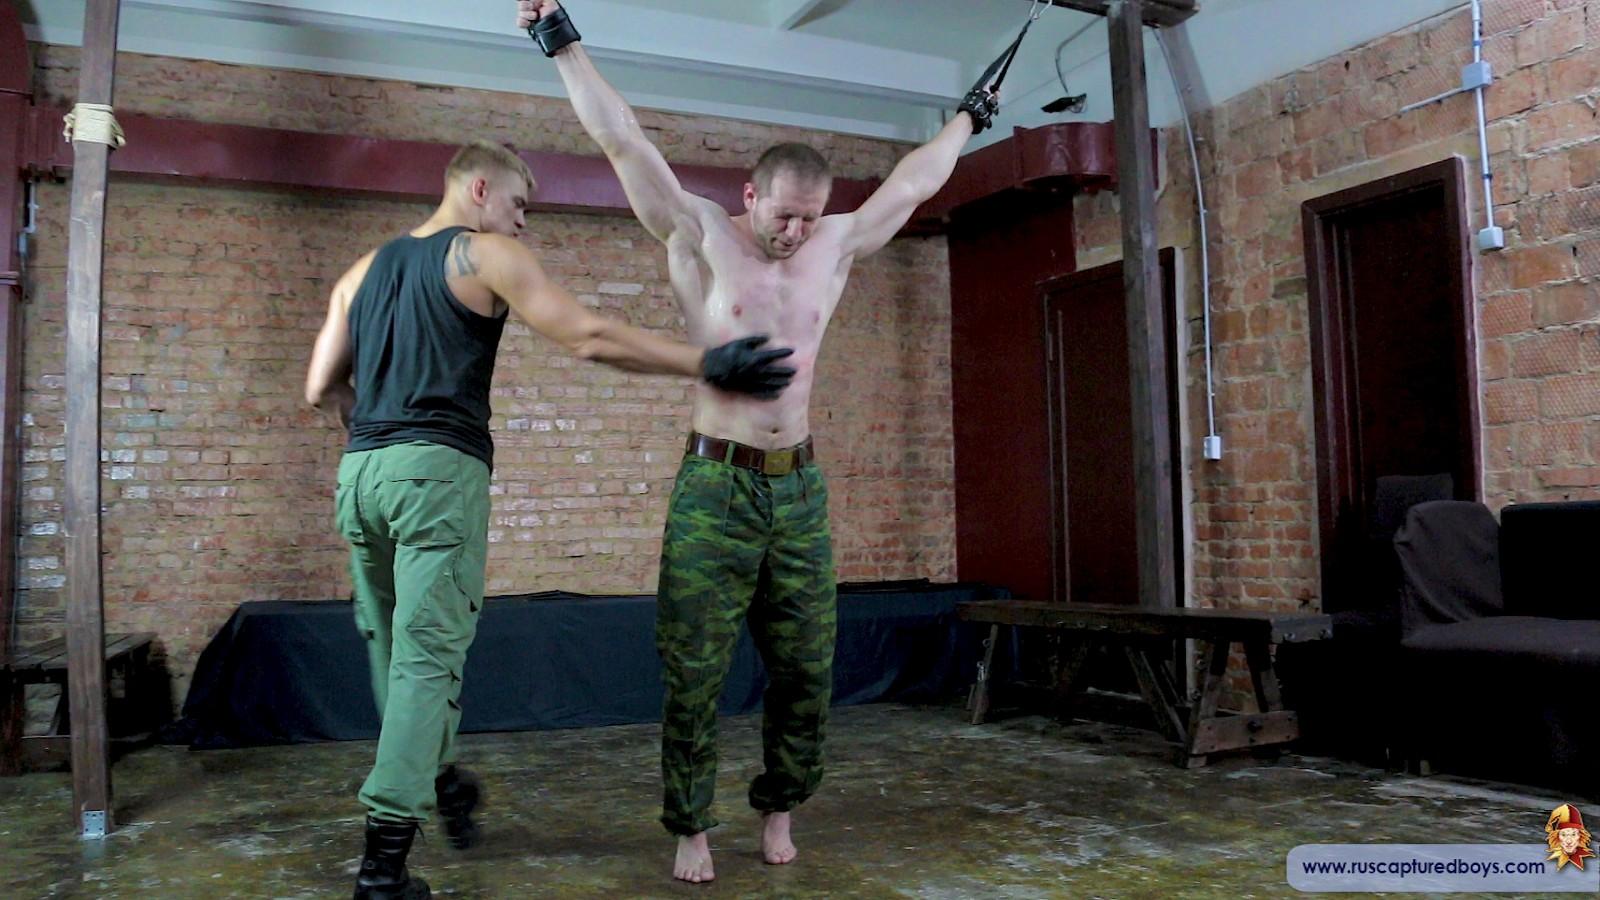 Russian Captured Boys male bdsm